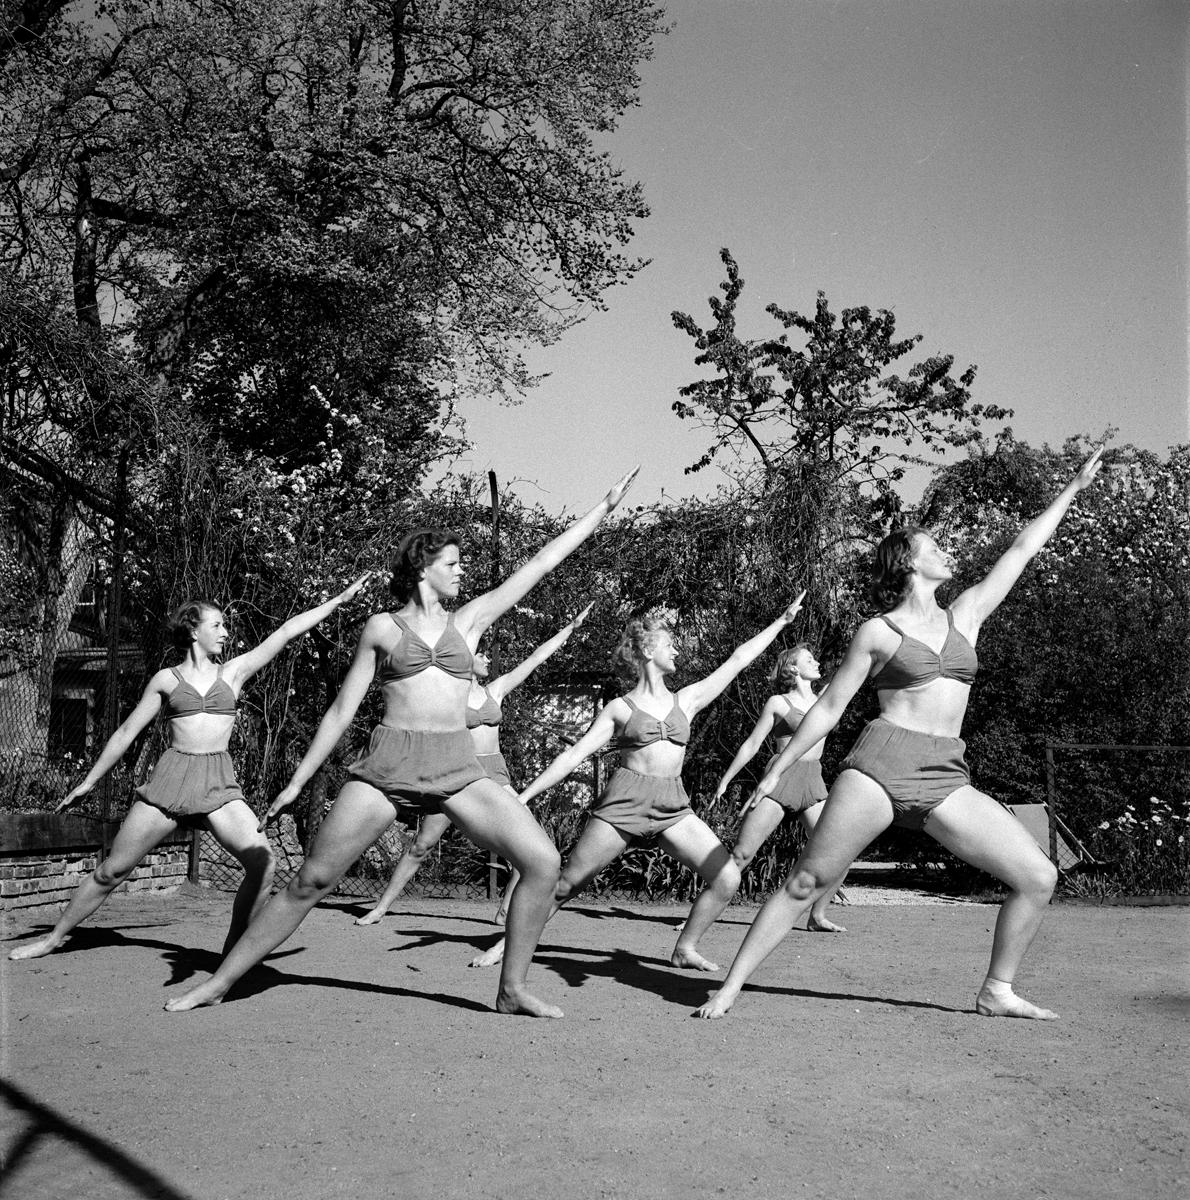 Women in bikinis, 1950s